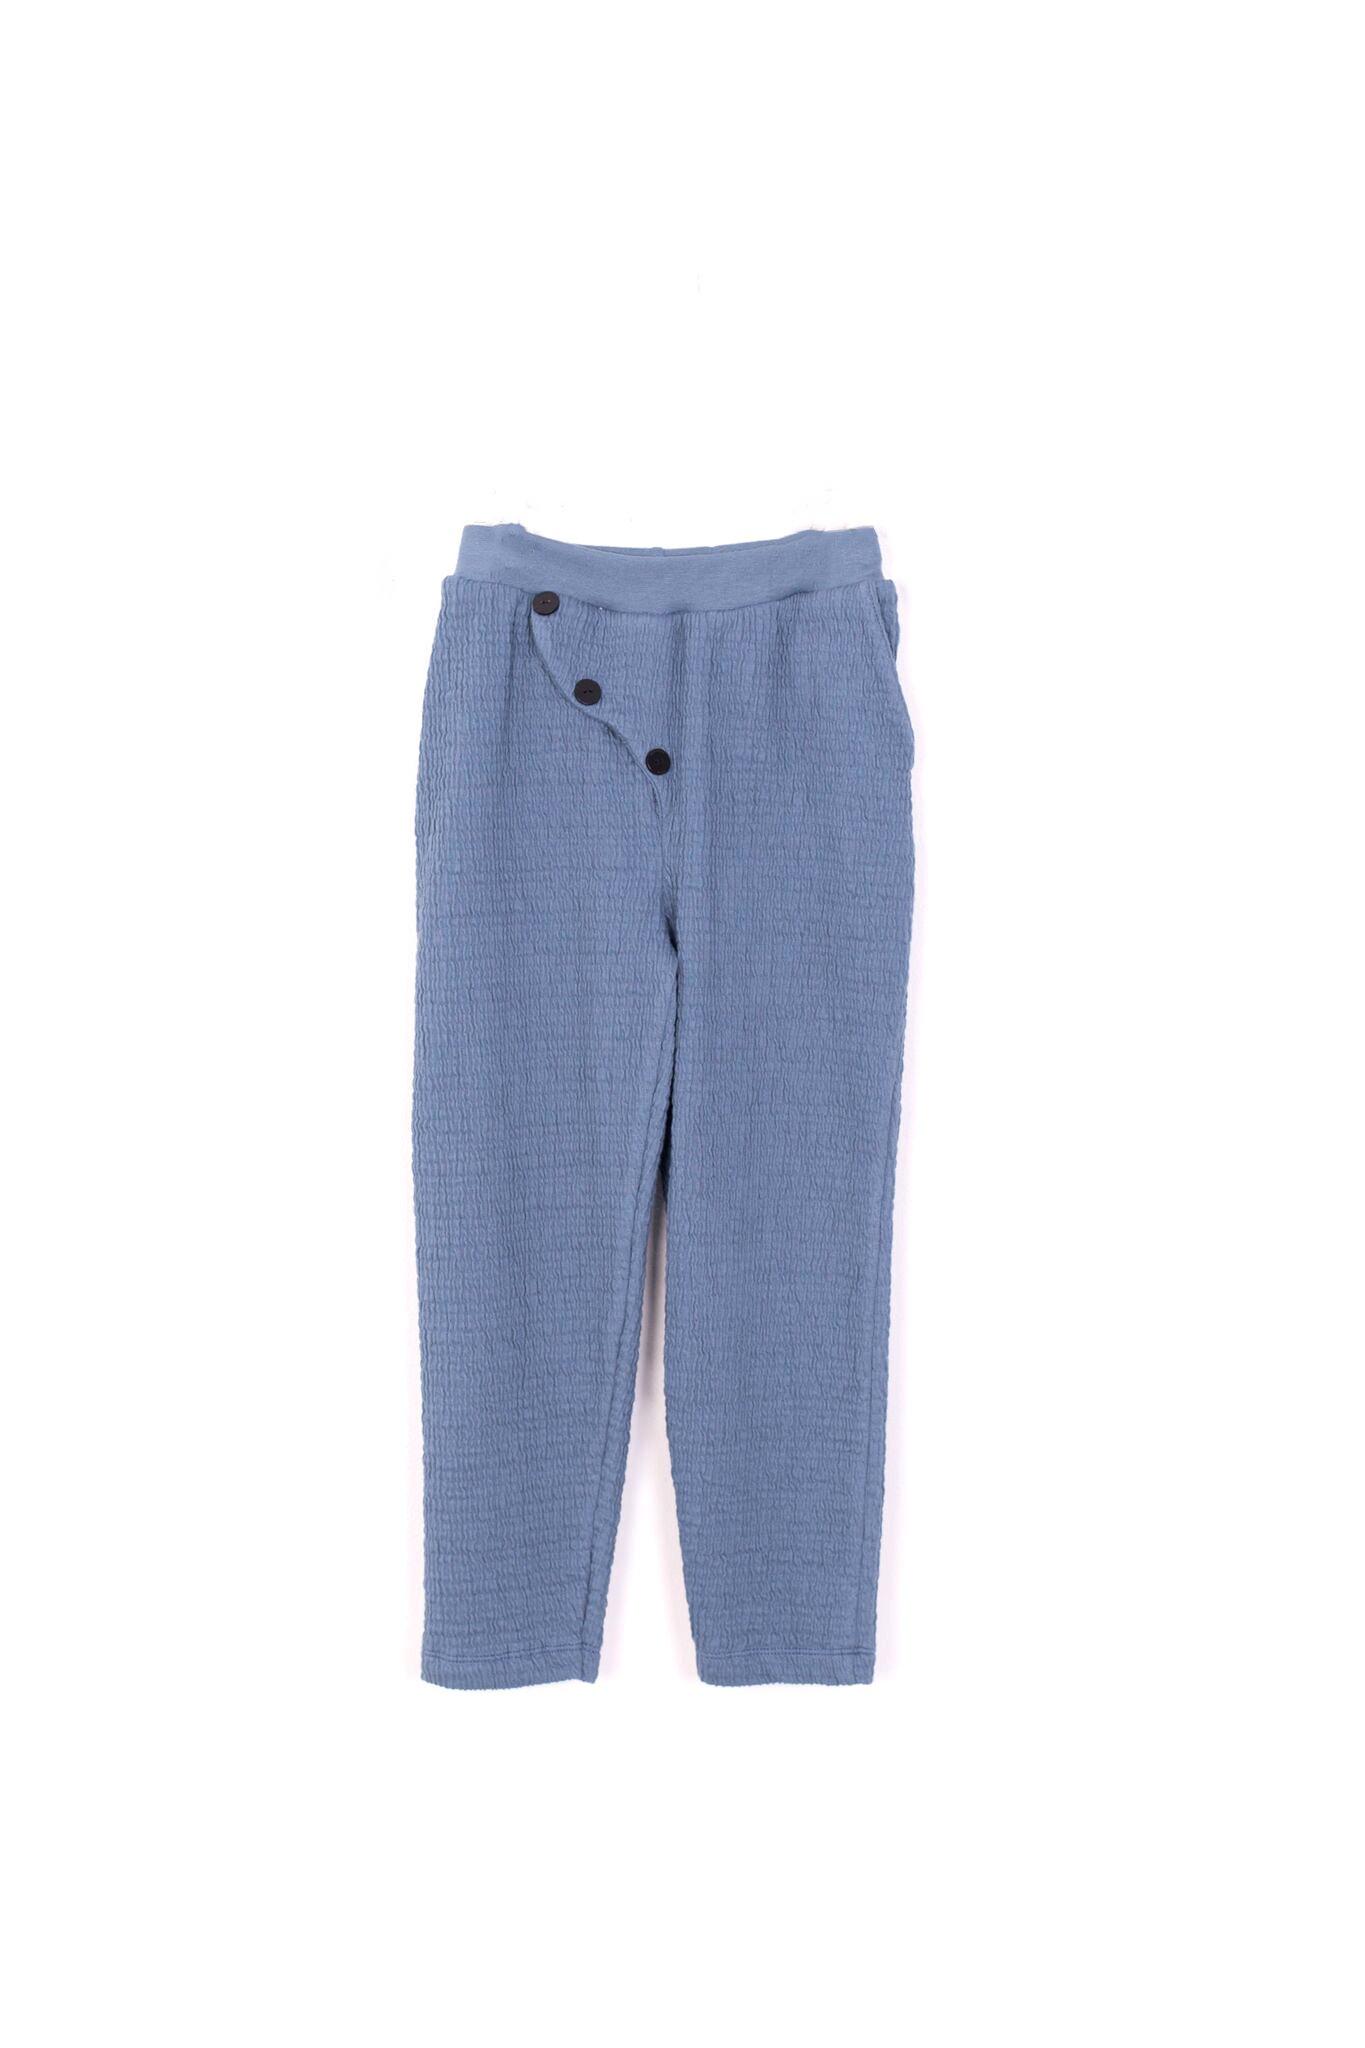 kodomo boston - motoreta boys and girls soft trousers